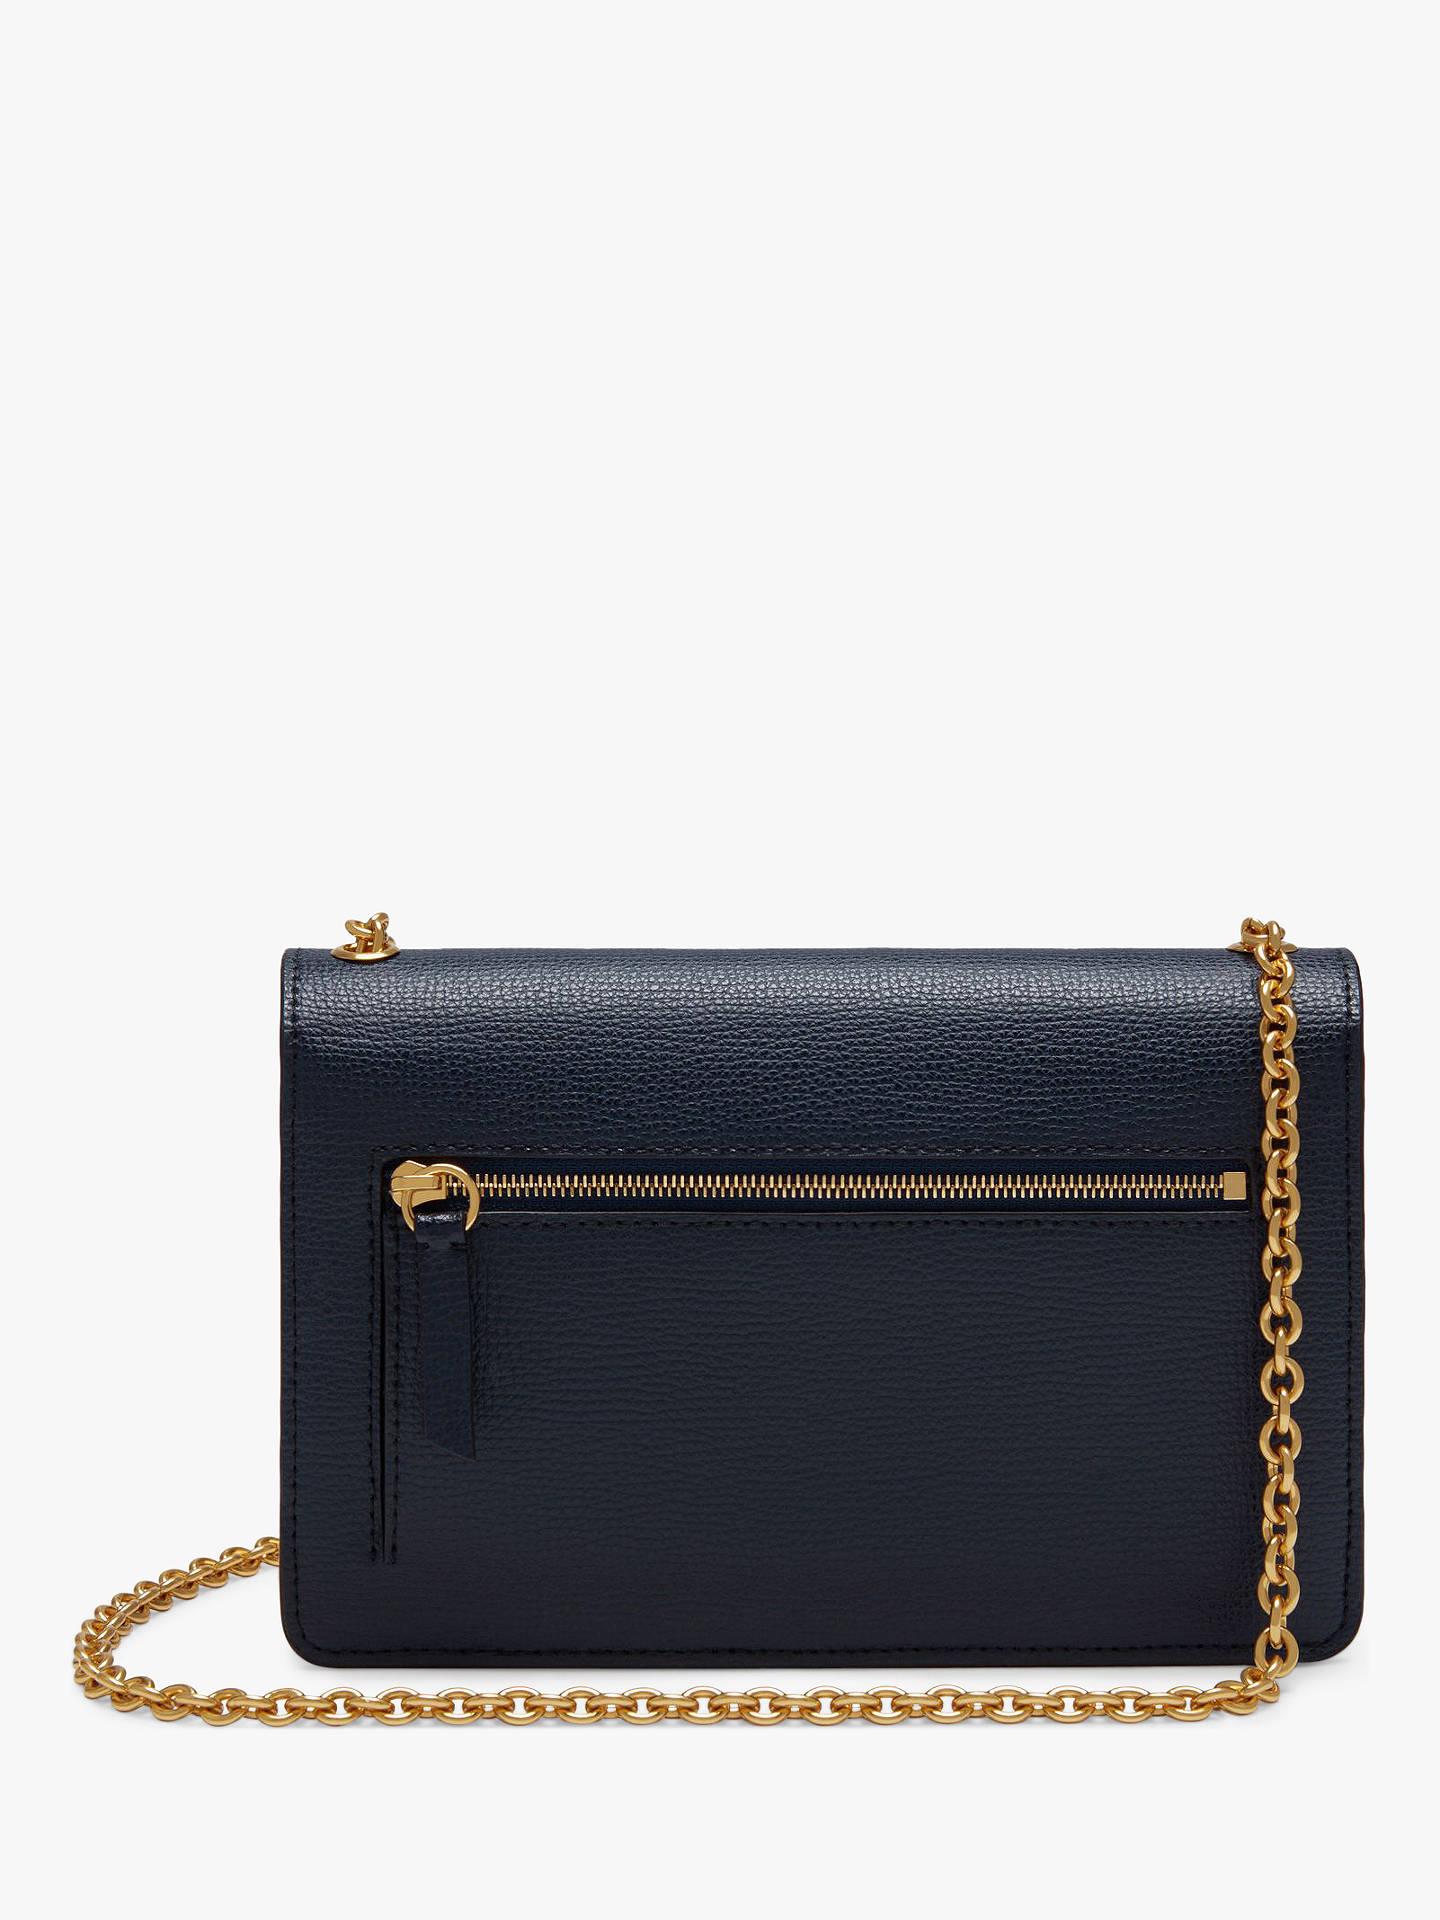 39c67cfaa2 ... Buy Mulberry Small Darley Cross Grain Leather Cross Body Bag